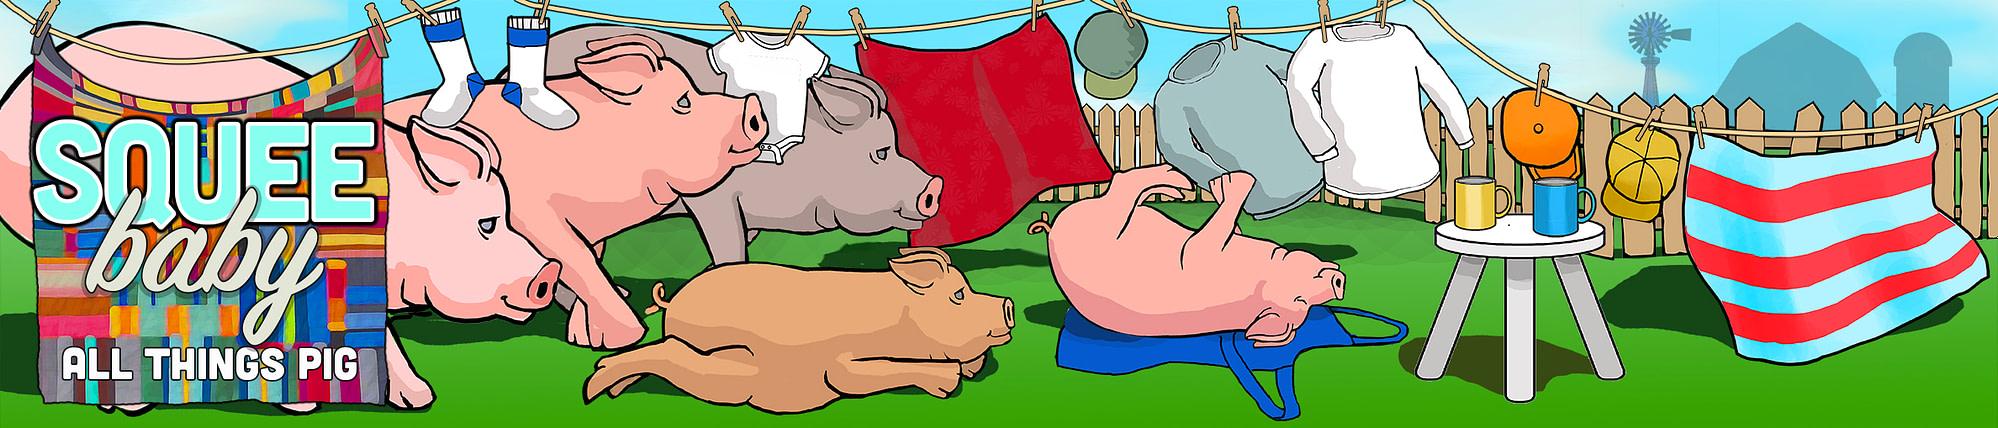 Squee Baby Pig Merchandise